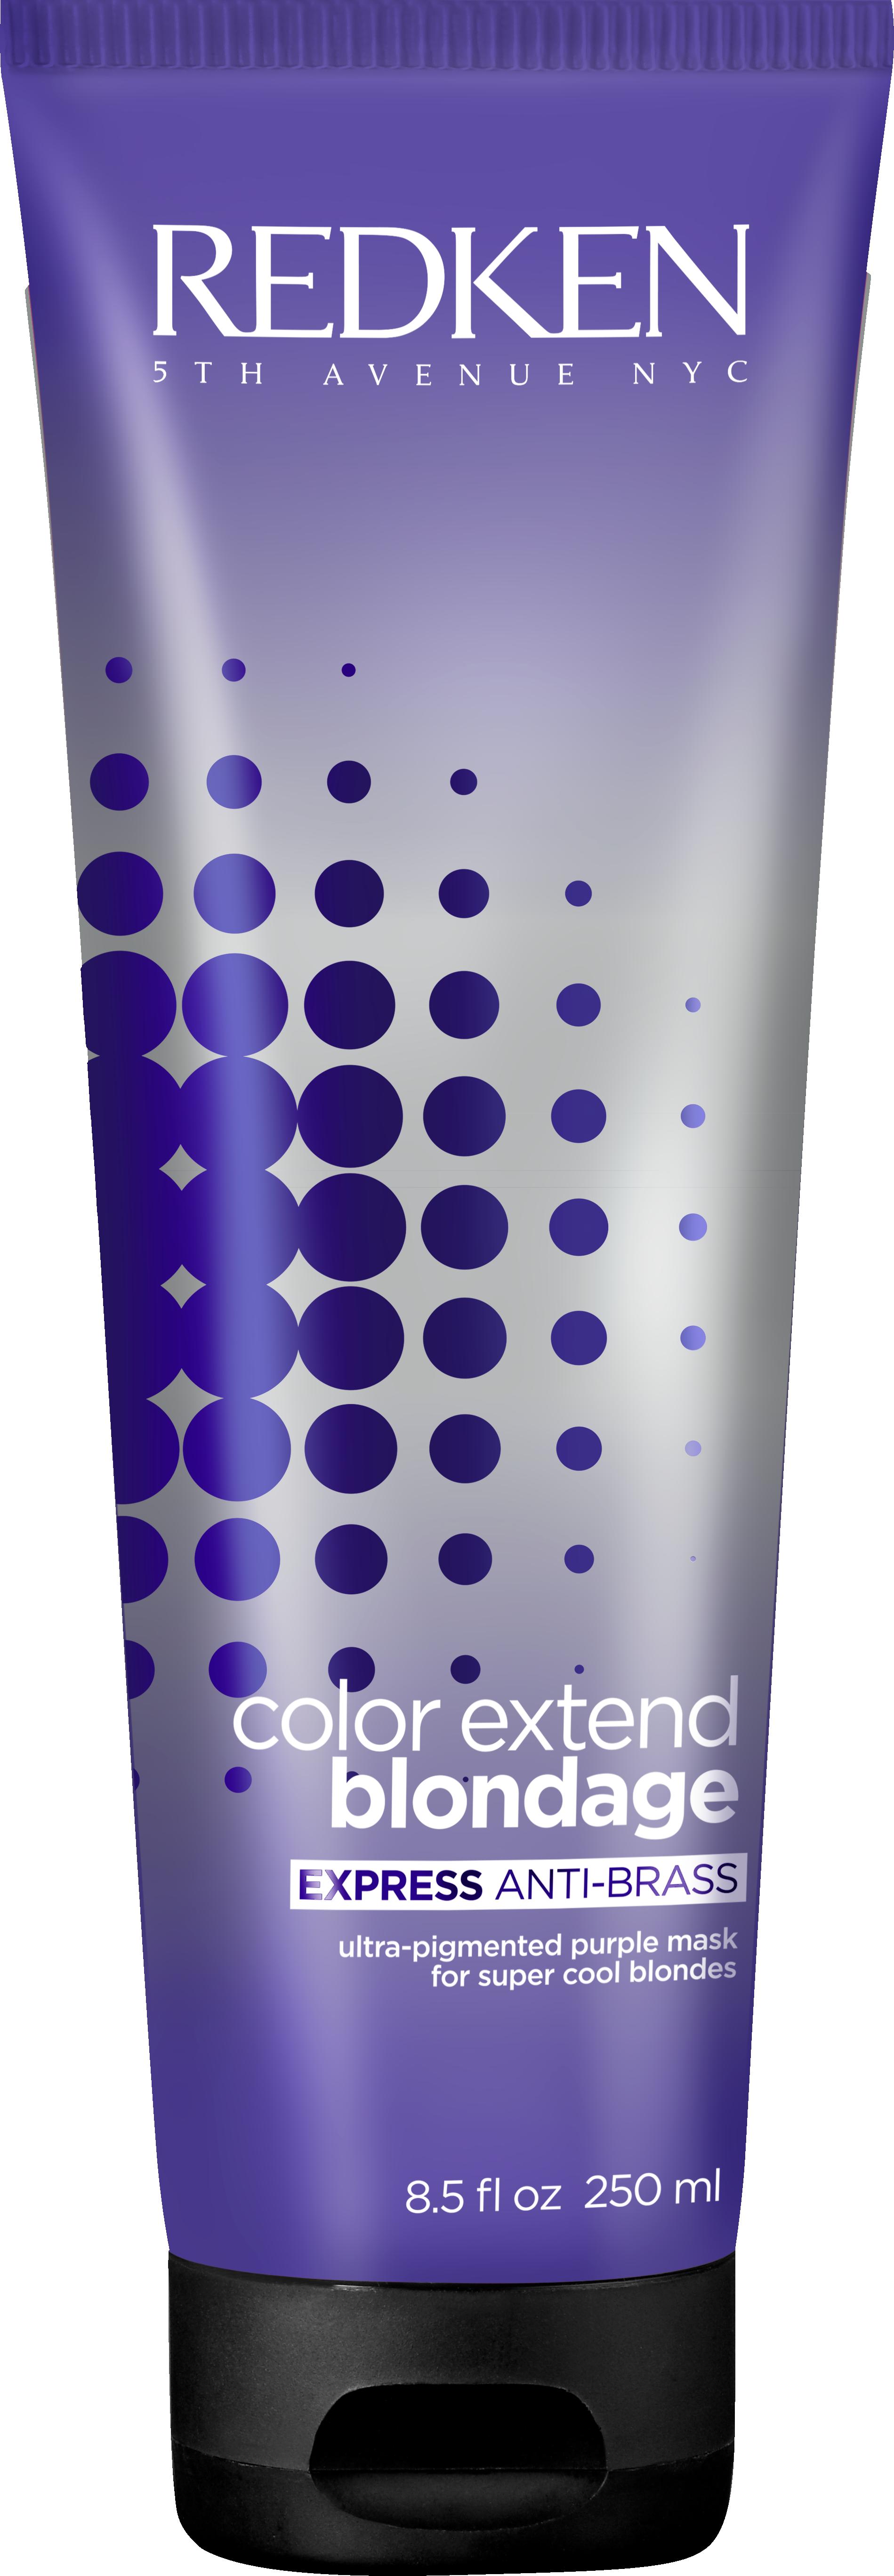 Redken-2019-Color-Extend-Blondage-Mask-RGB